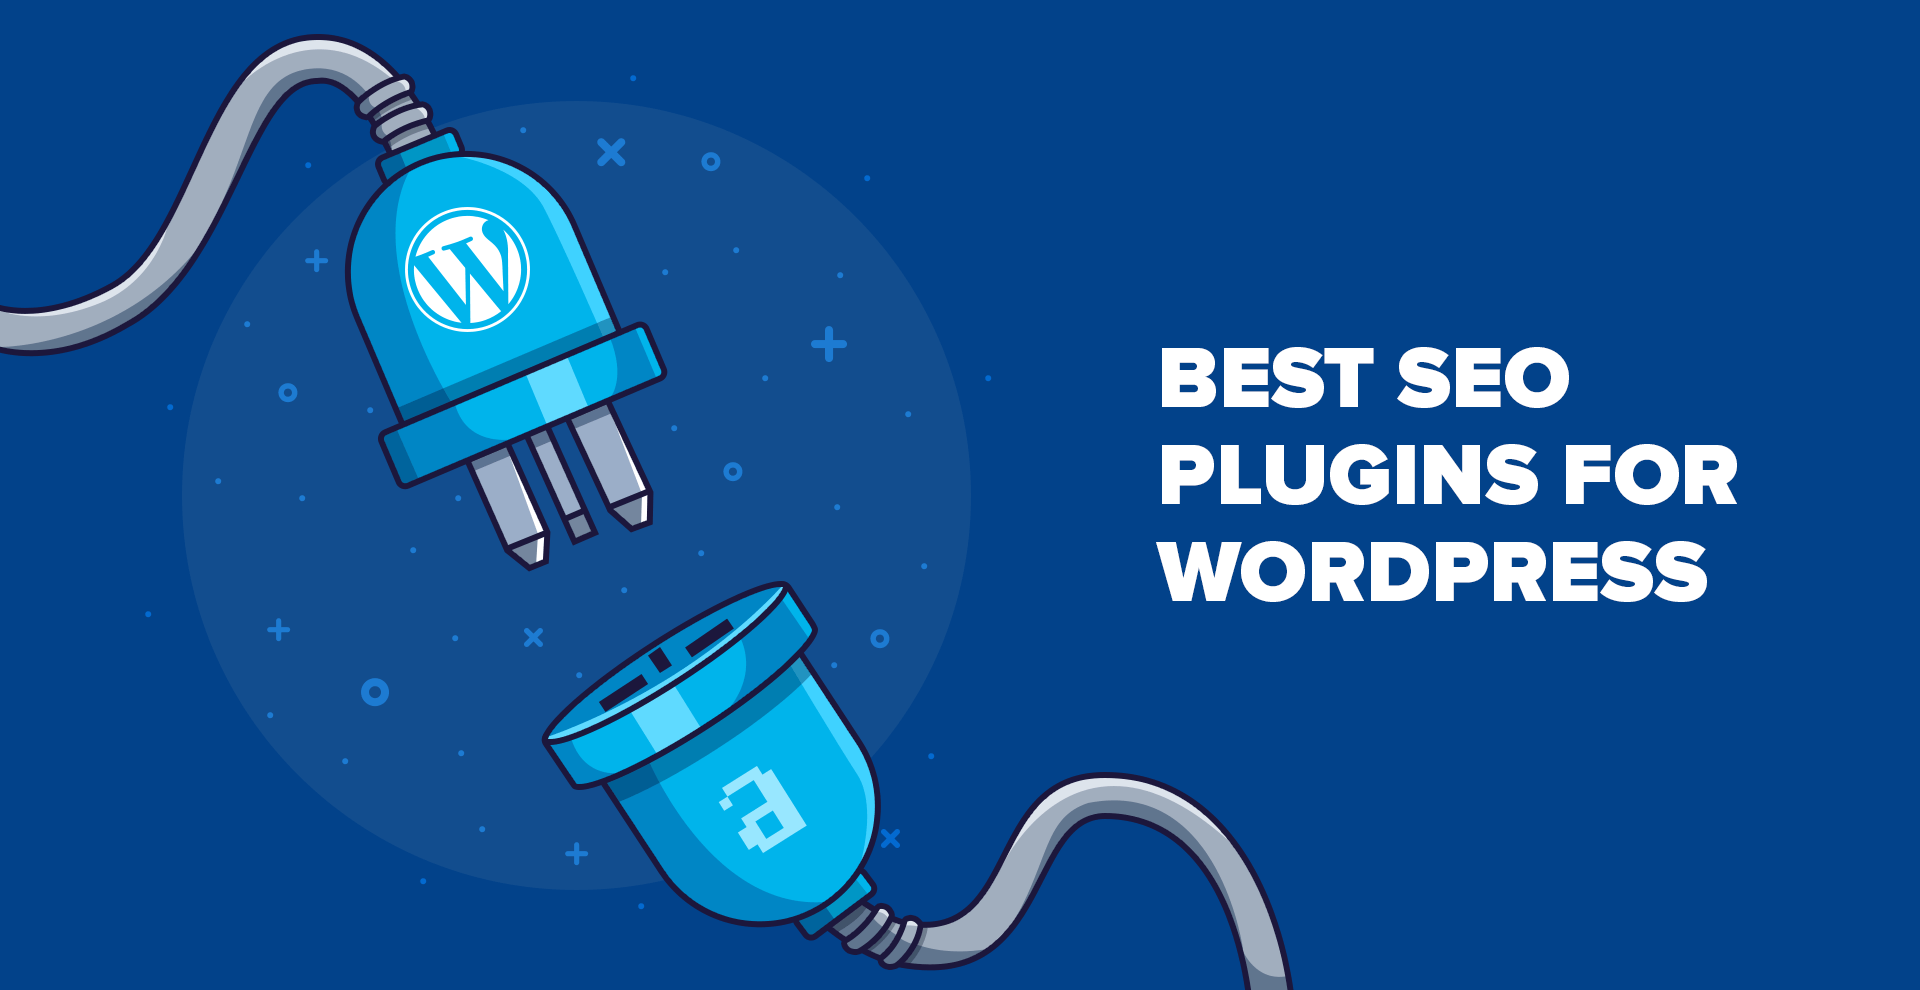 mejores-plugins-seo-para-wordpress